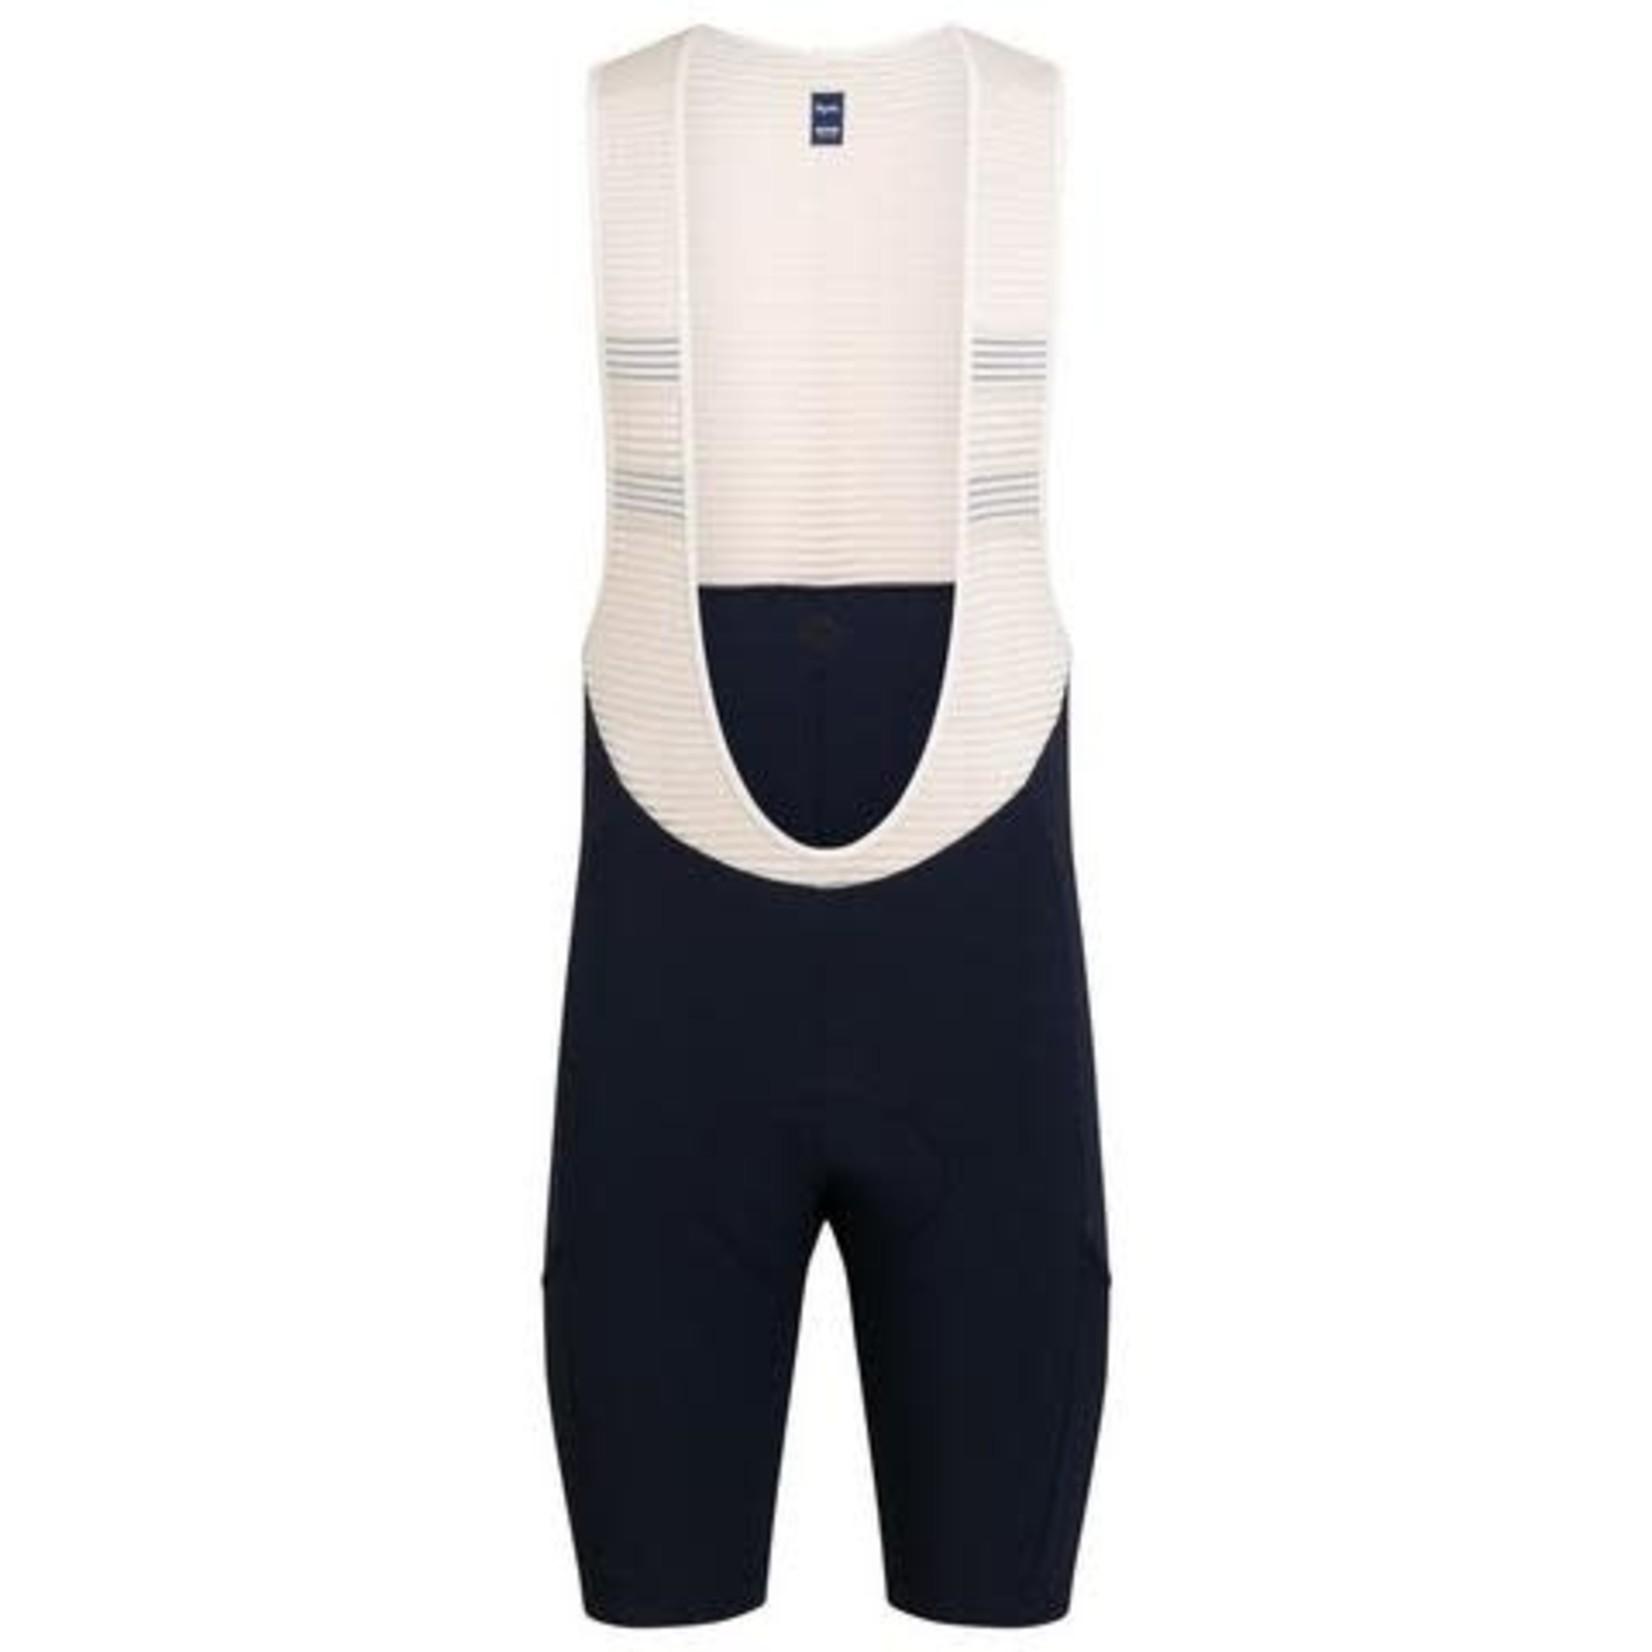 Rapha Rapha Cargo Bib Shorts